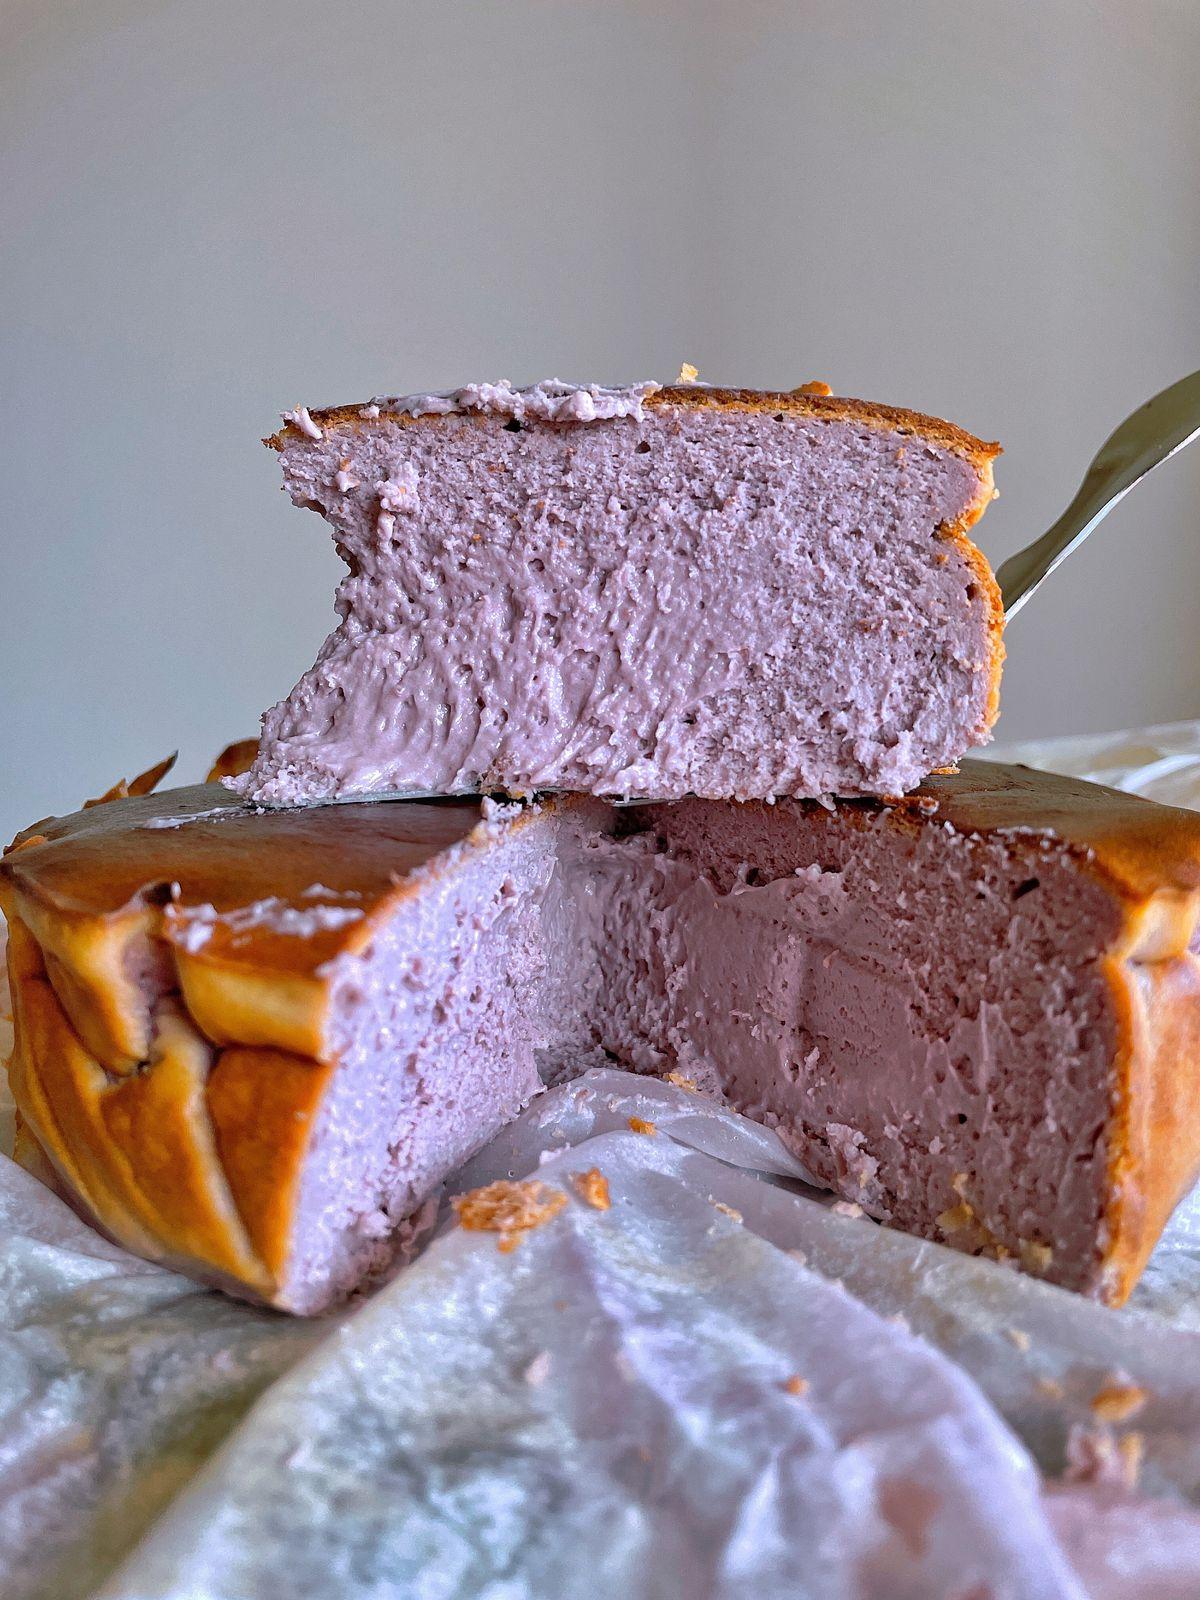 a slice of purple cheesecake.